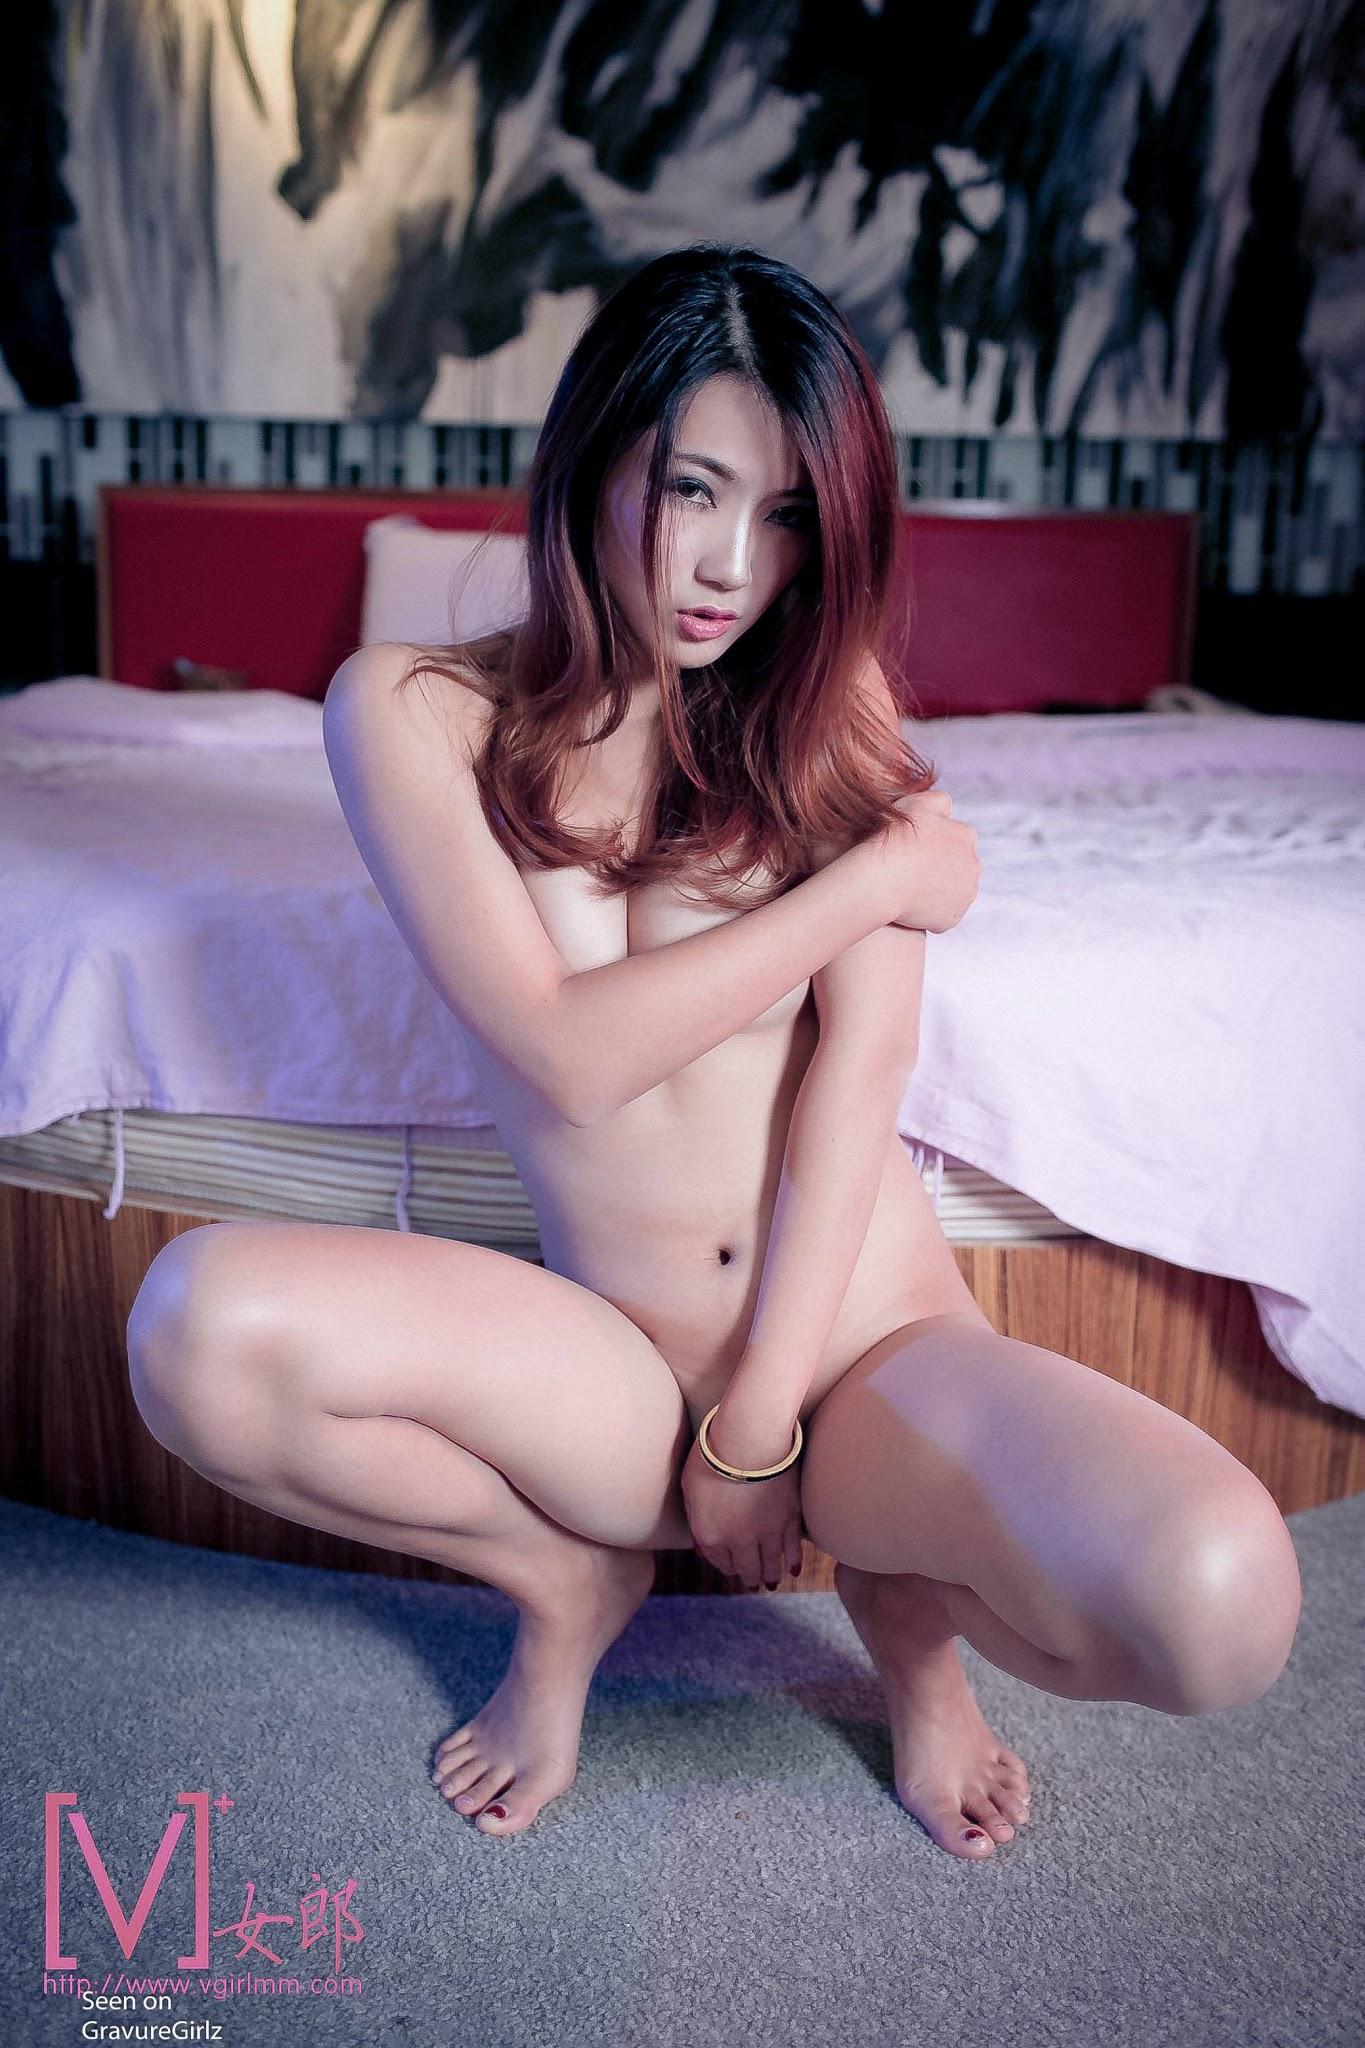 Jeen Nude Gallery Update 台港陸 @ 東莞V女郎2015 | | - Photo Gallery 3